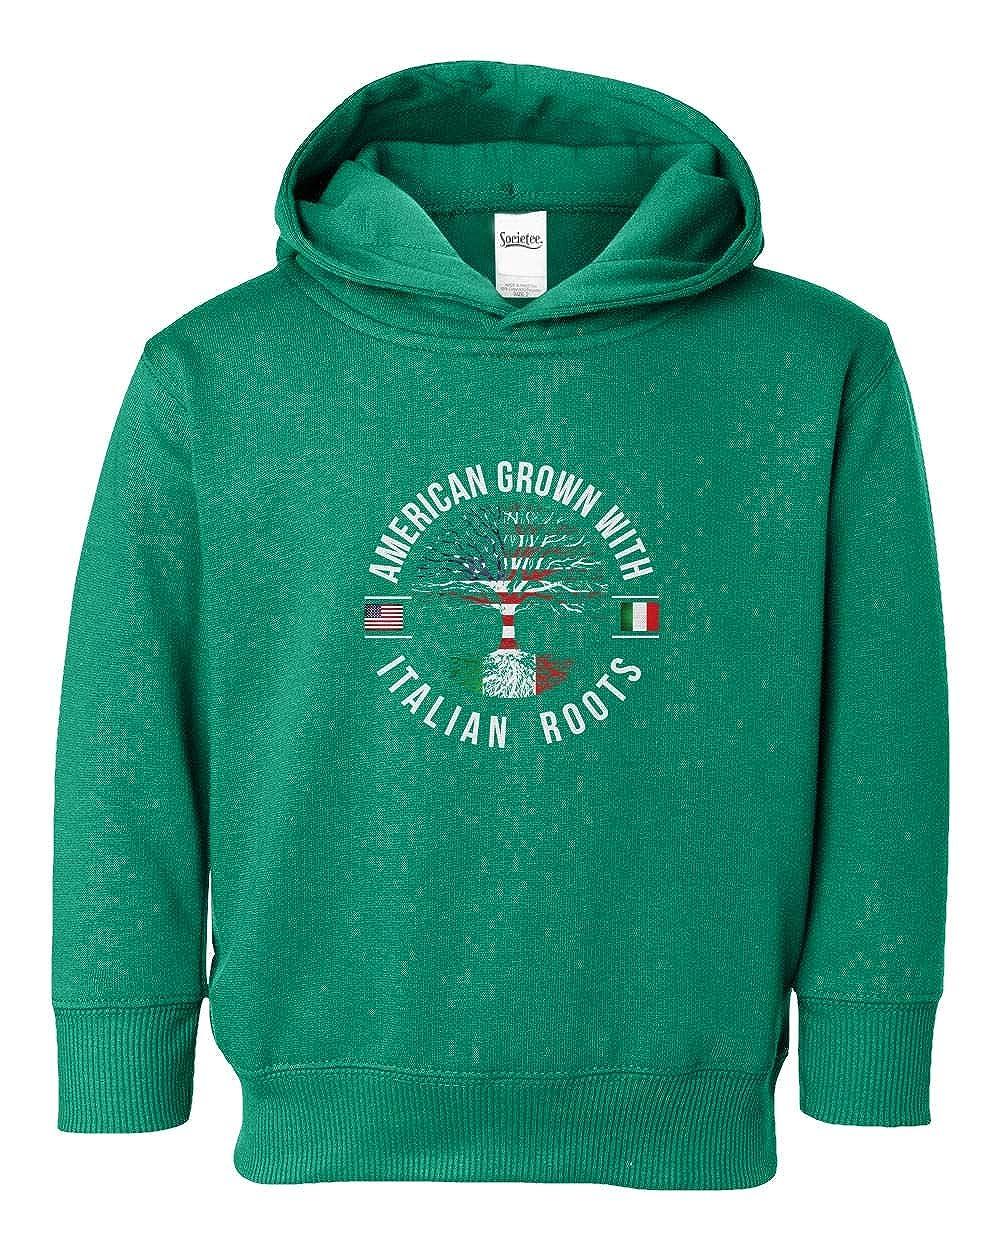 Societee American Grown with Italian Roots Youth /& Toddler Hoodie Sweatshirt